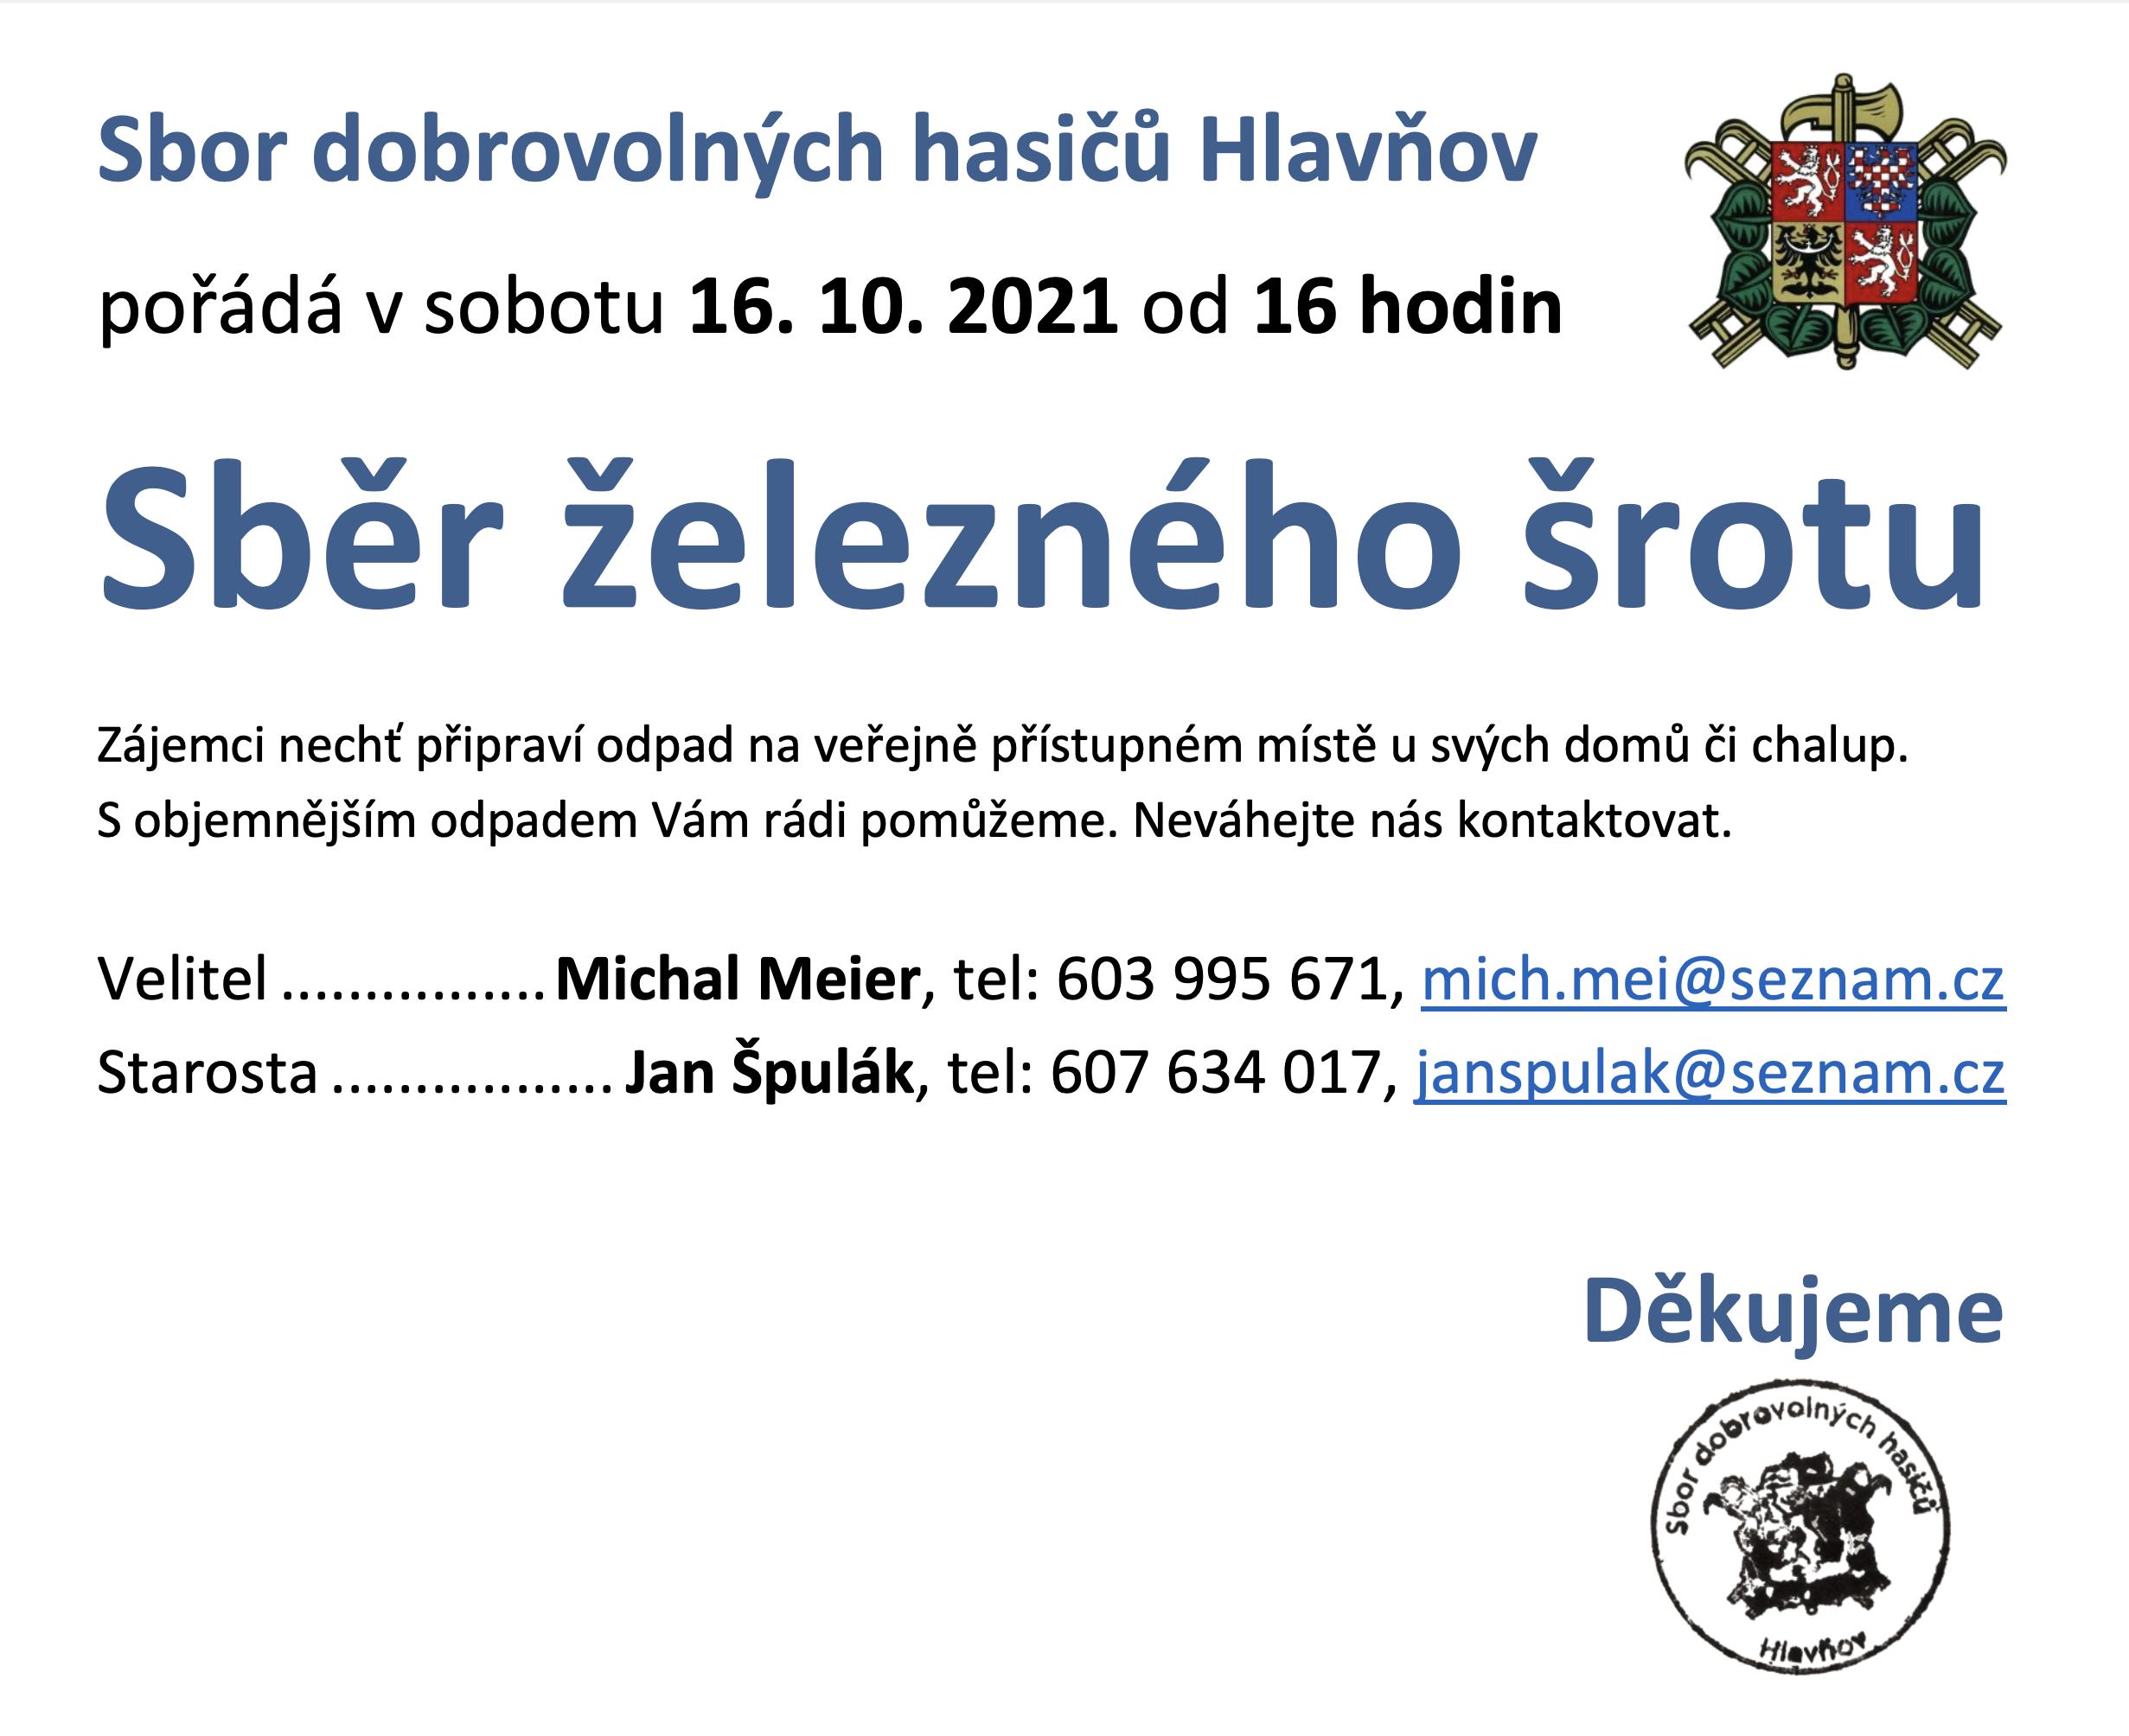 2021-10-07_sber_srotu.png (740 KB)